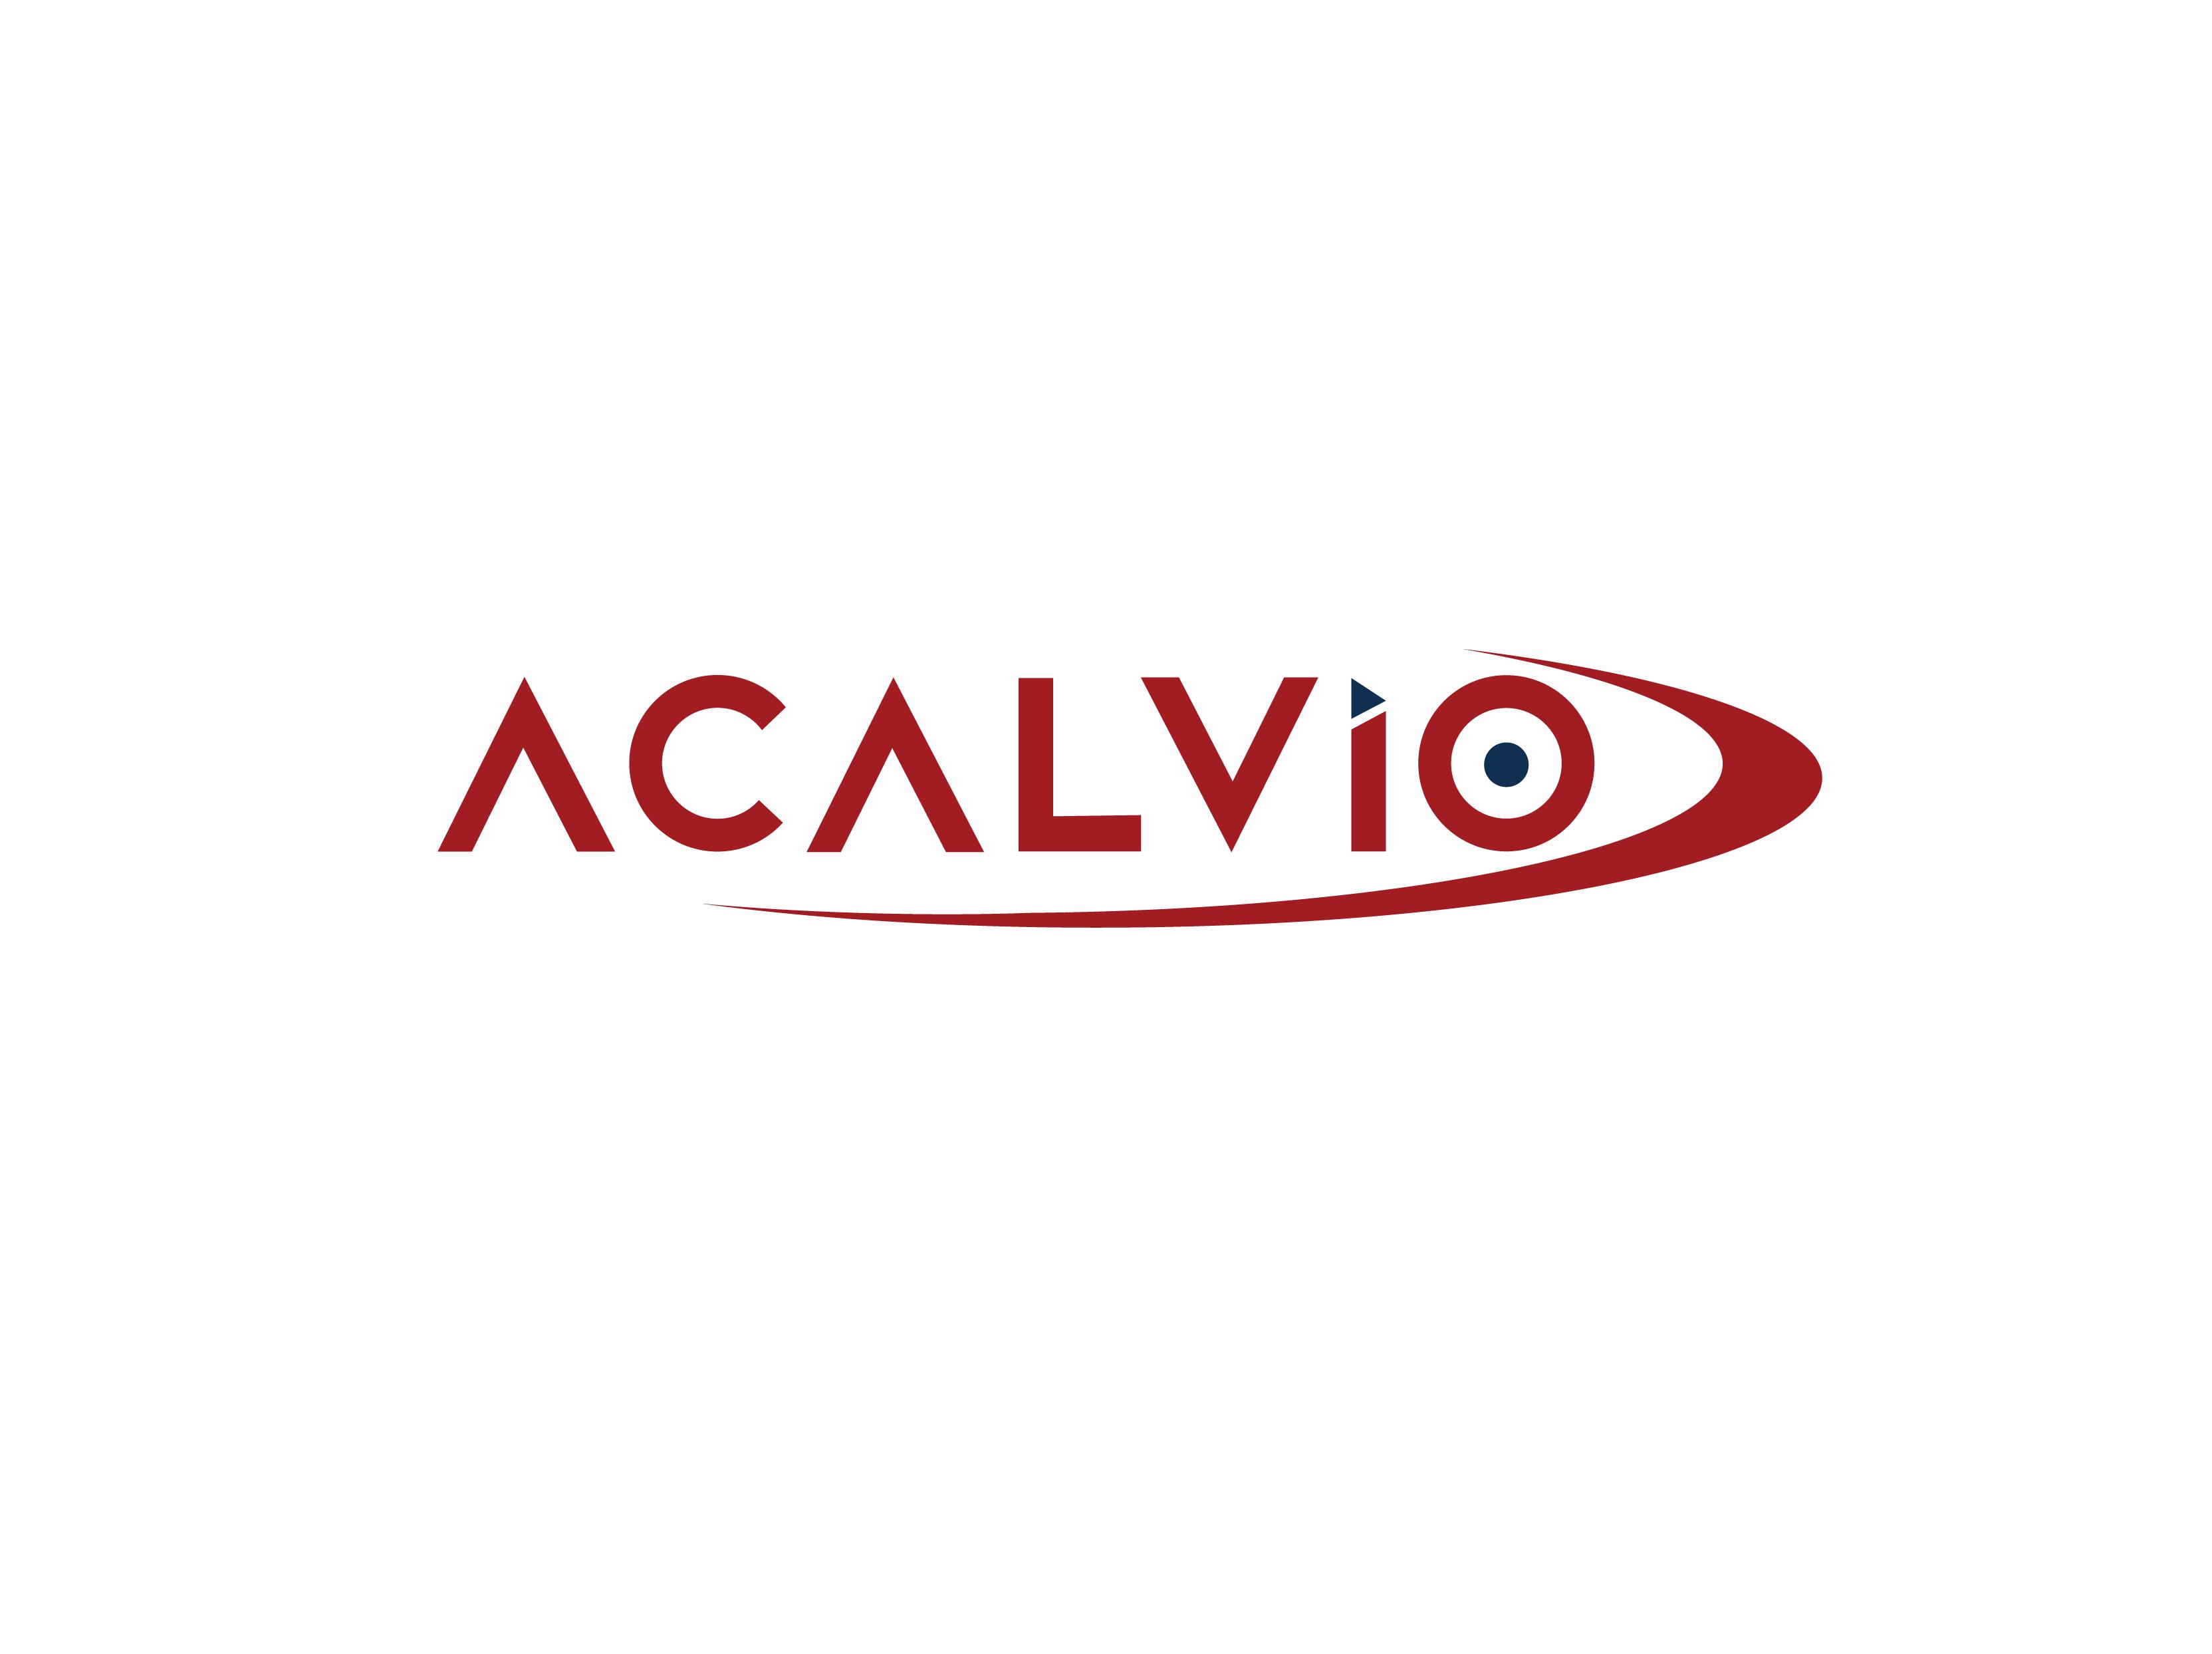 Acalvio